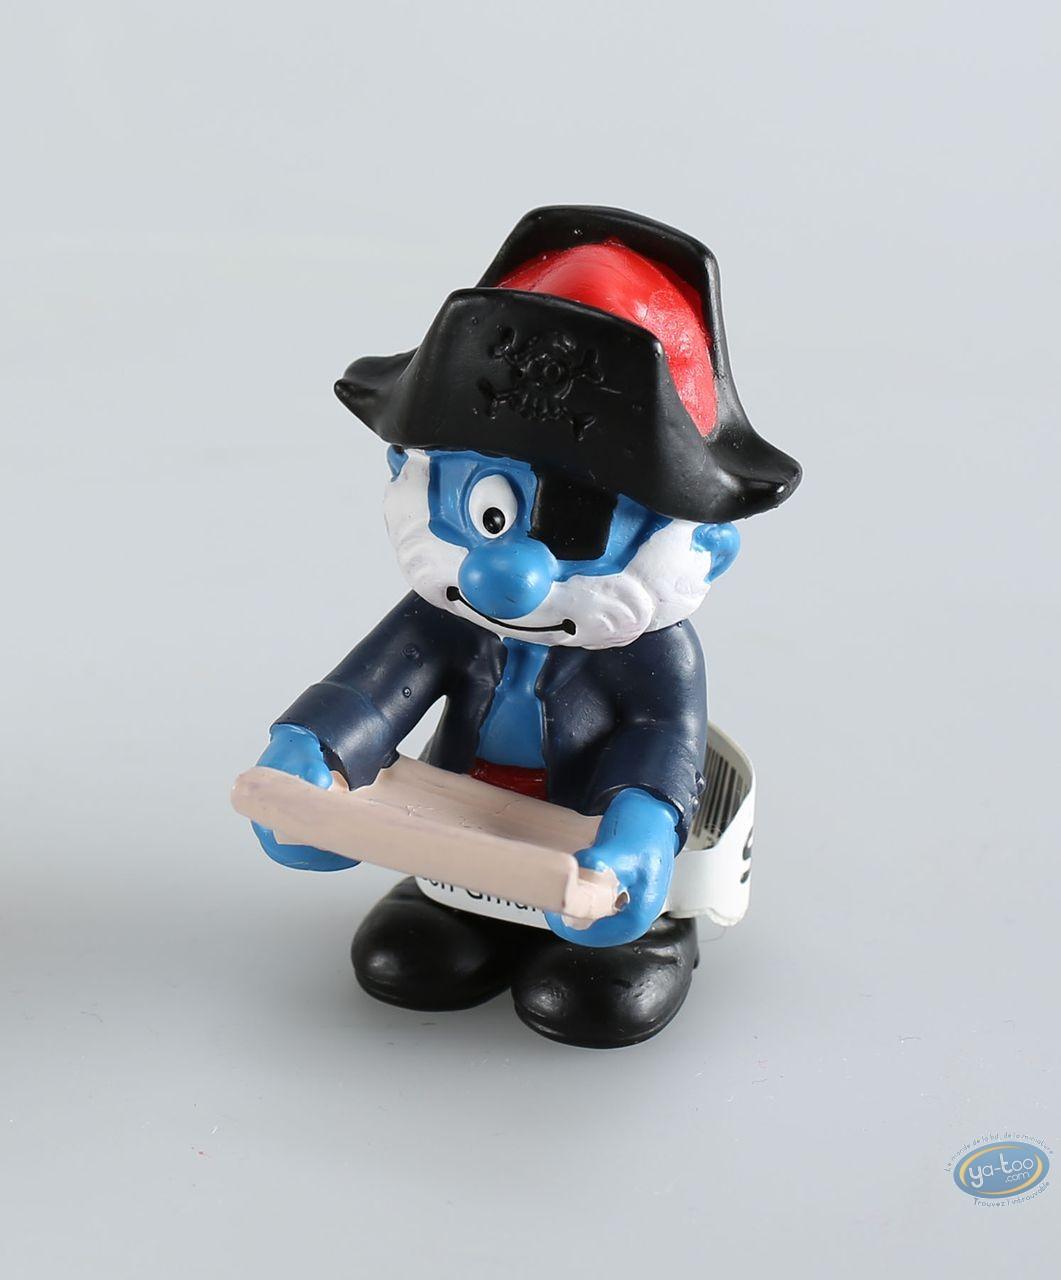 Plastic Figurine, Smurfs (The) : Captain Smurf